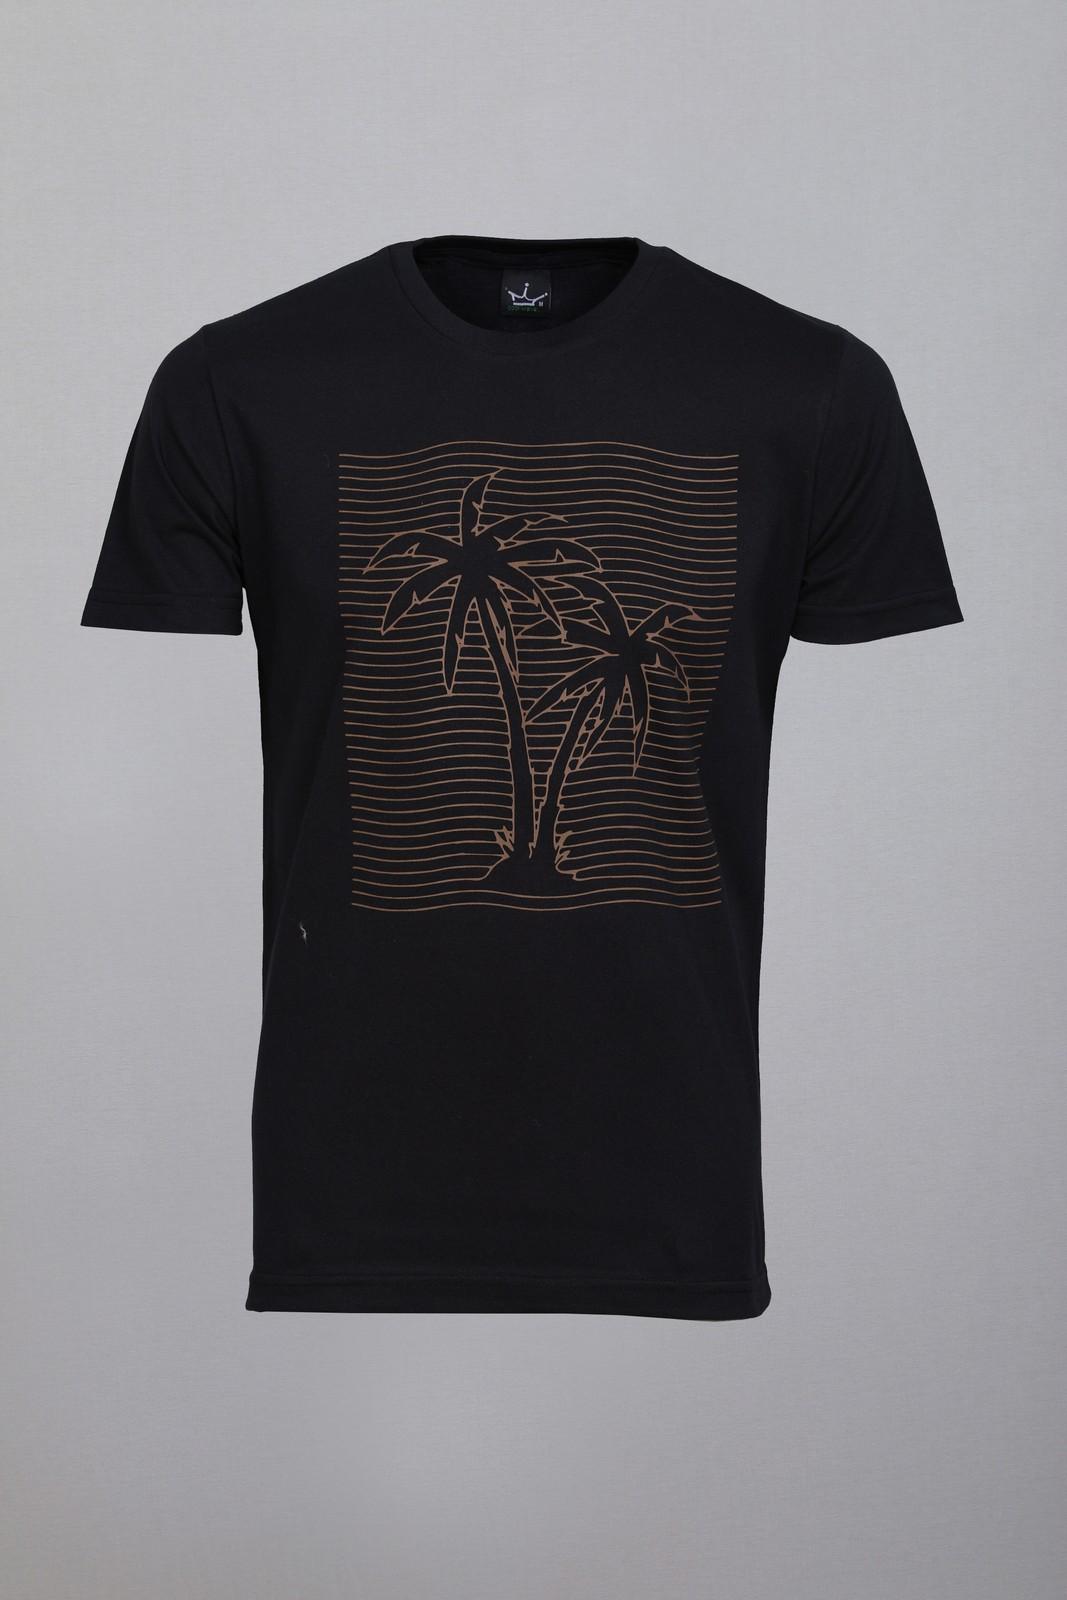 Camiseta CoolWave Coqueiro Preta